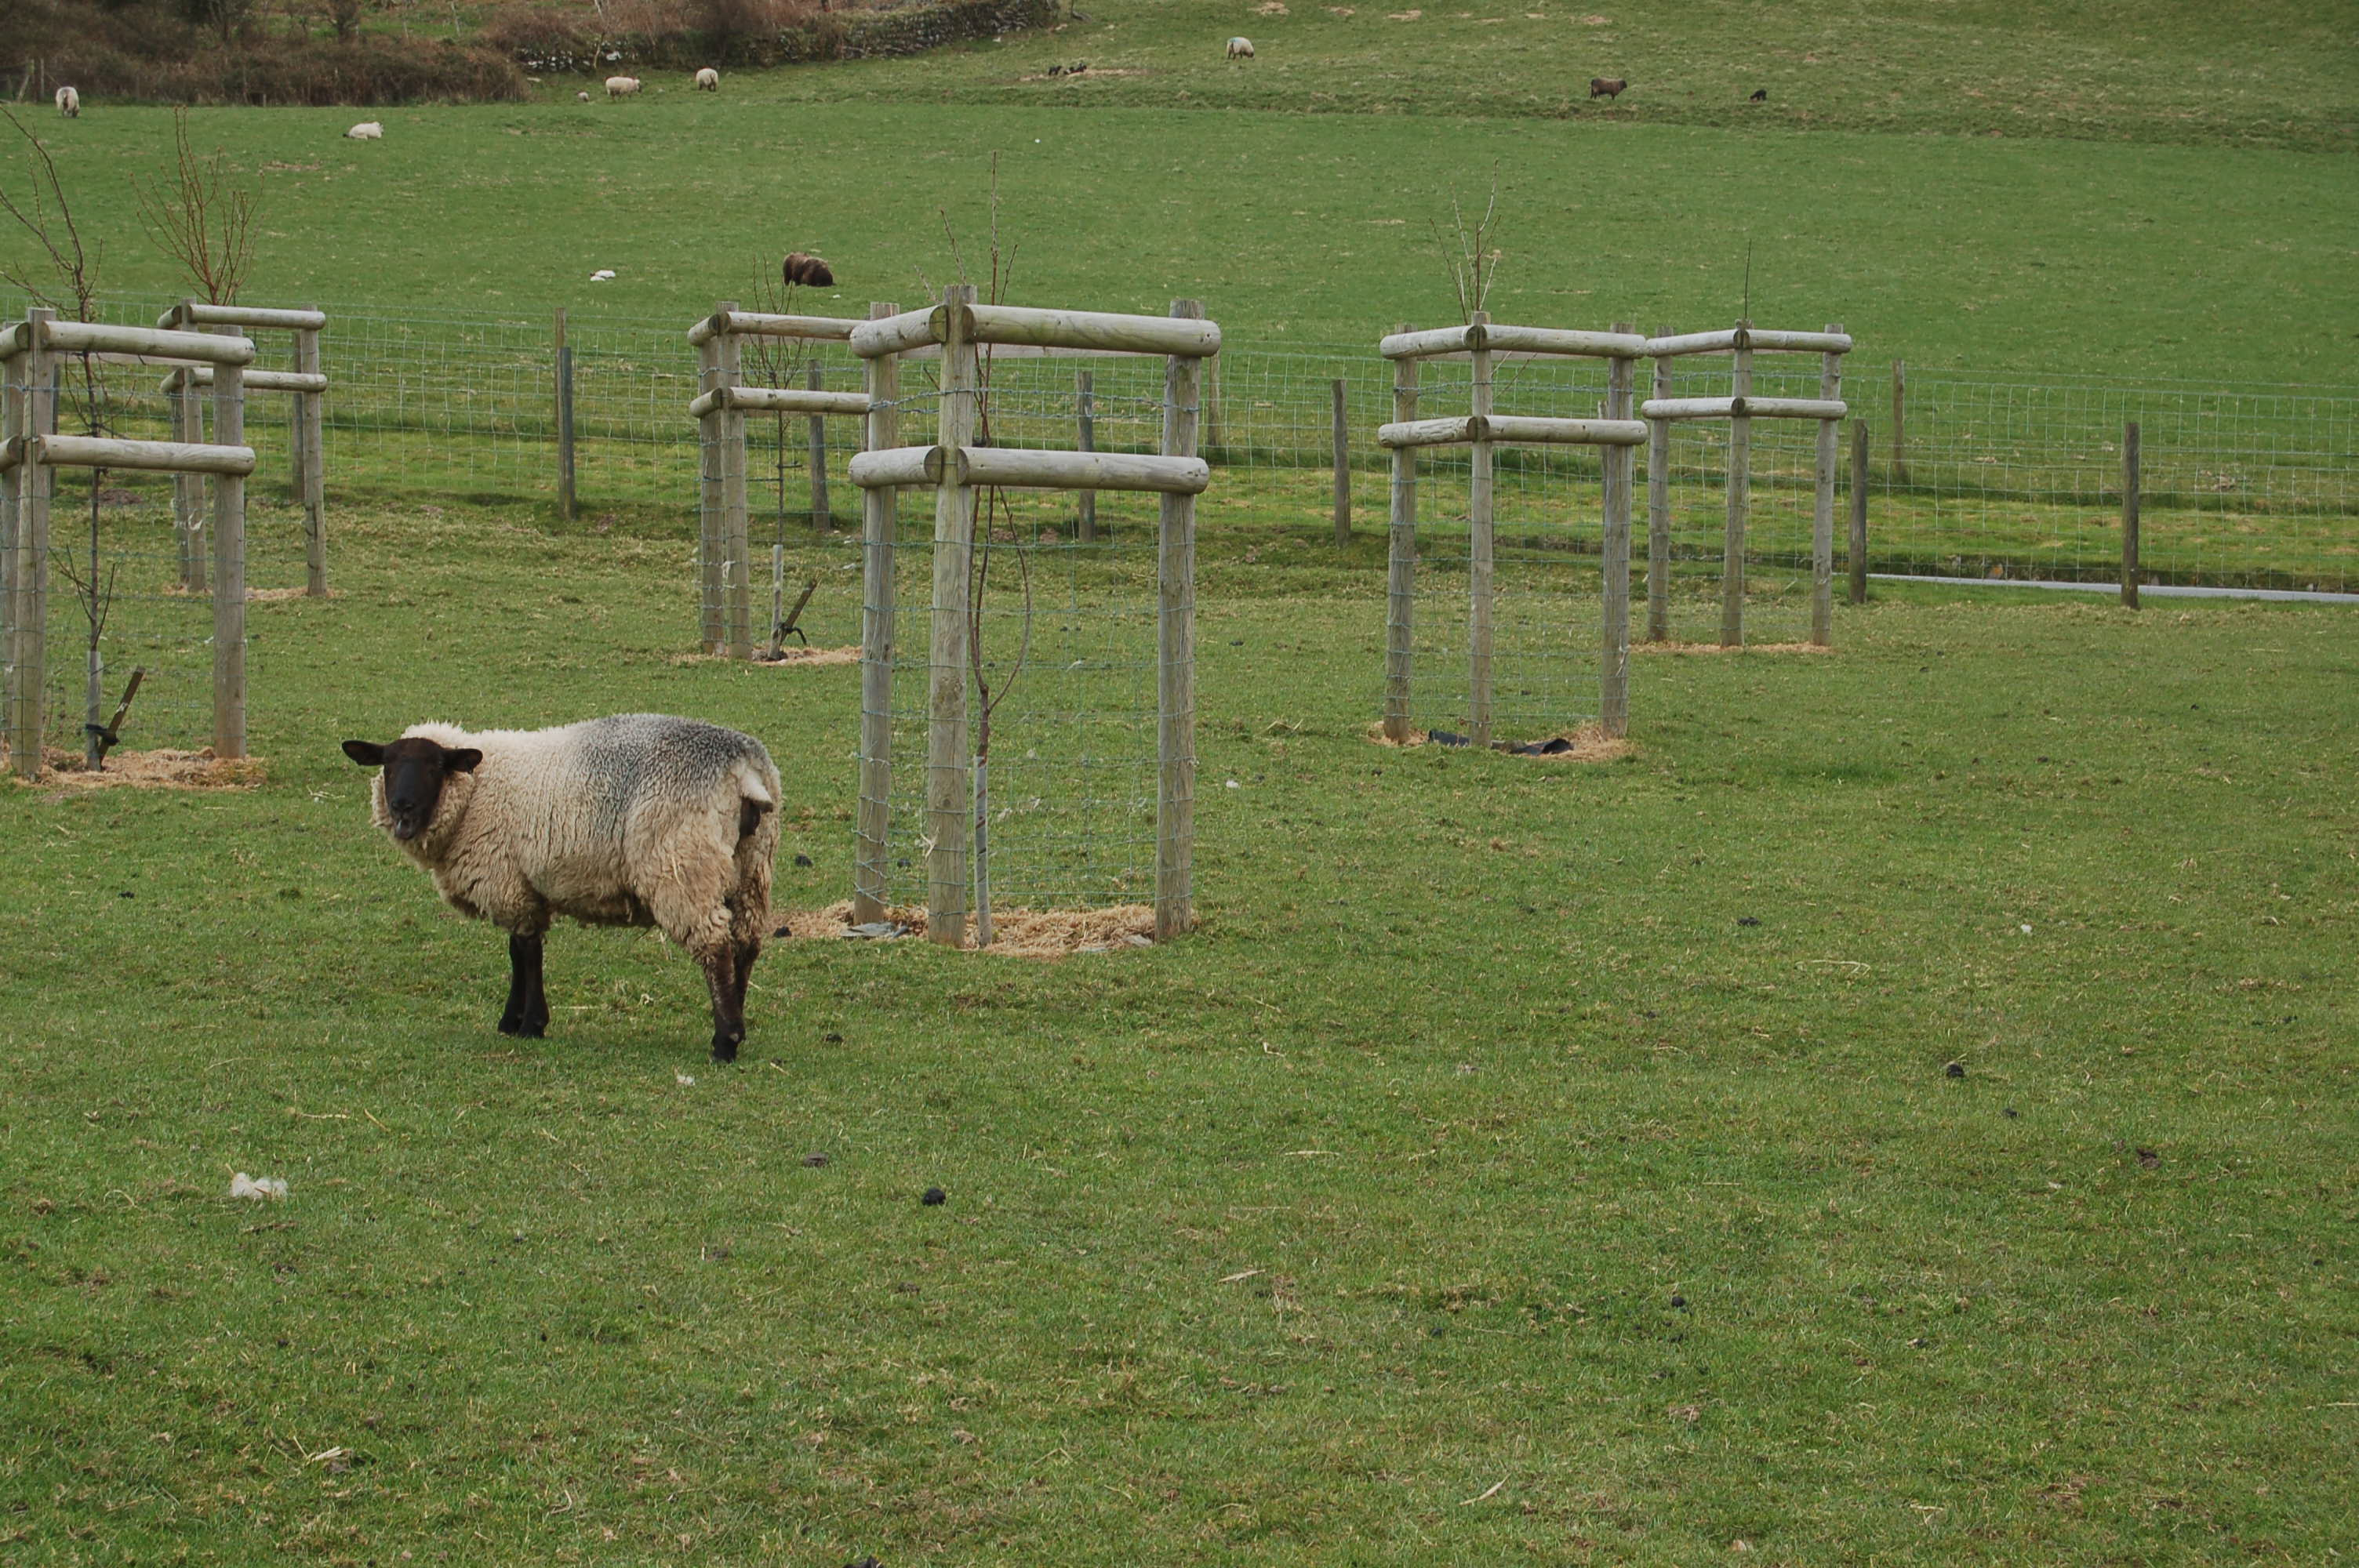 Lost sheep among saplings in putative orchard